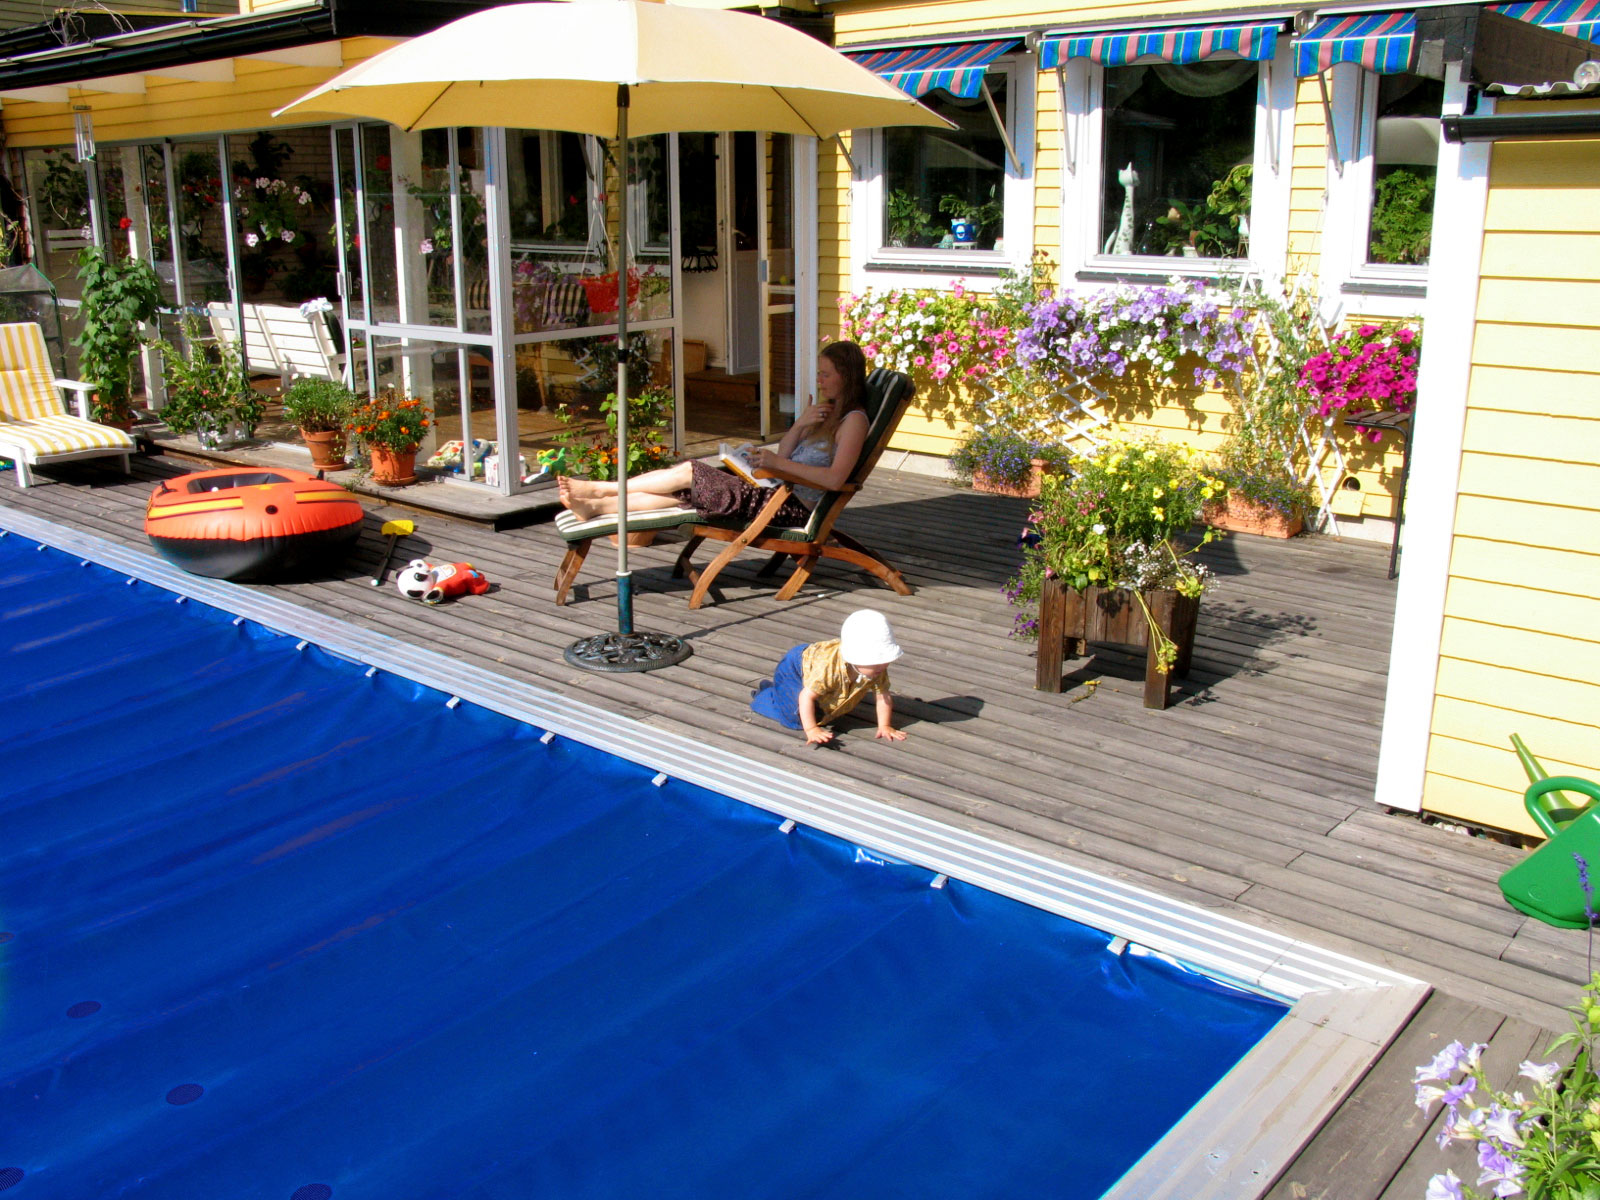 pahlen-poolguard